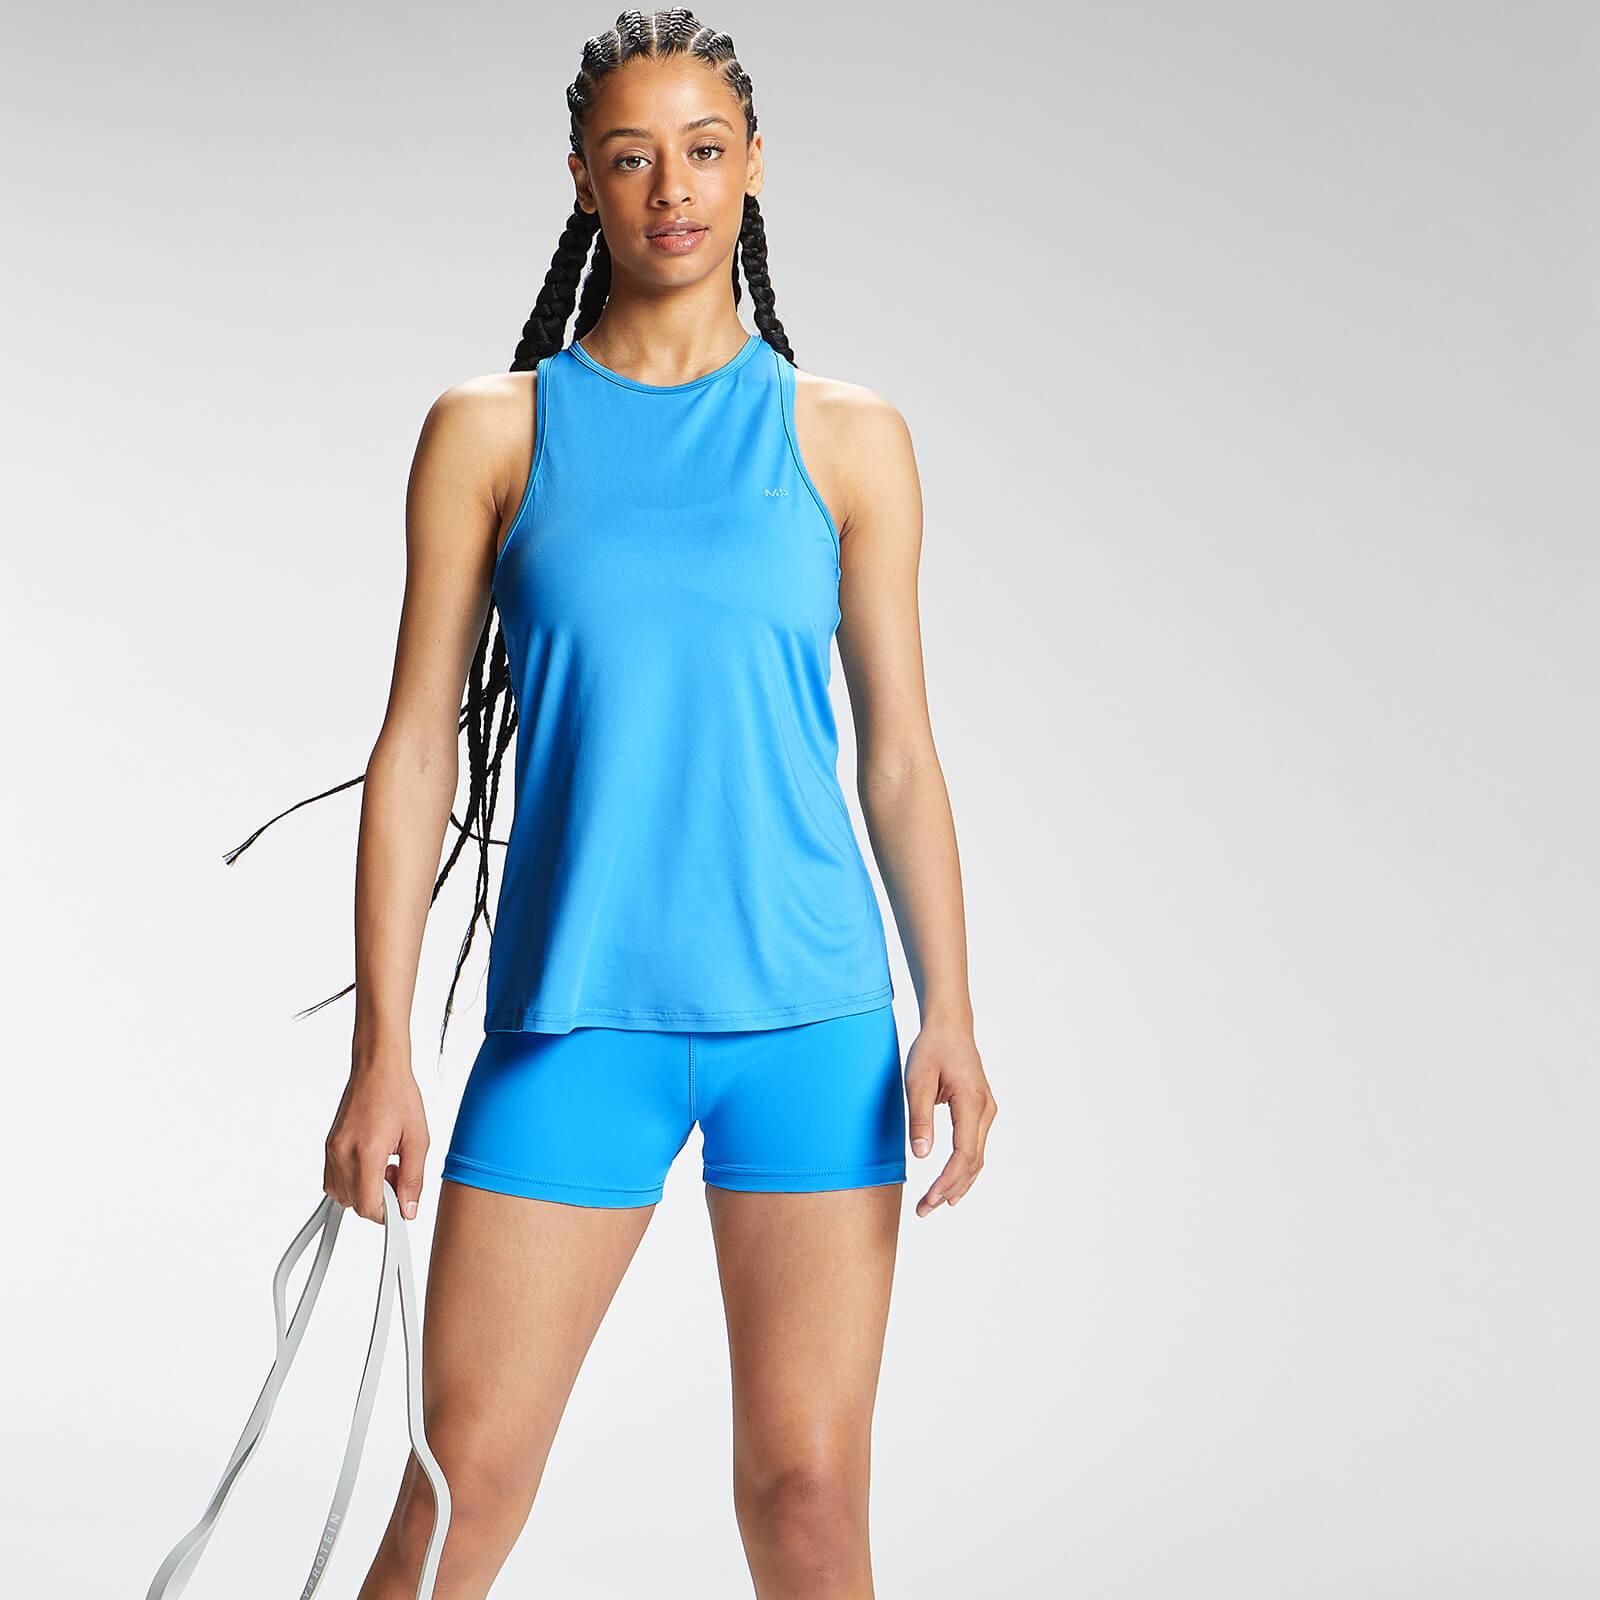 Купить MP Women's Repeat MP Training Racerback Vest - Bright Blue - XXS, Myprotein International